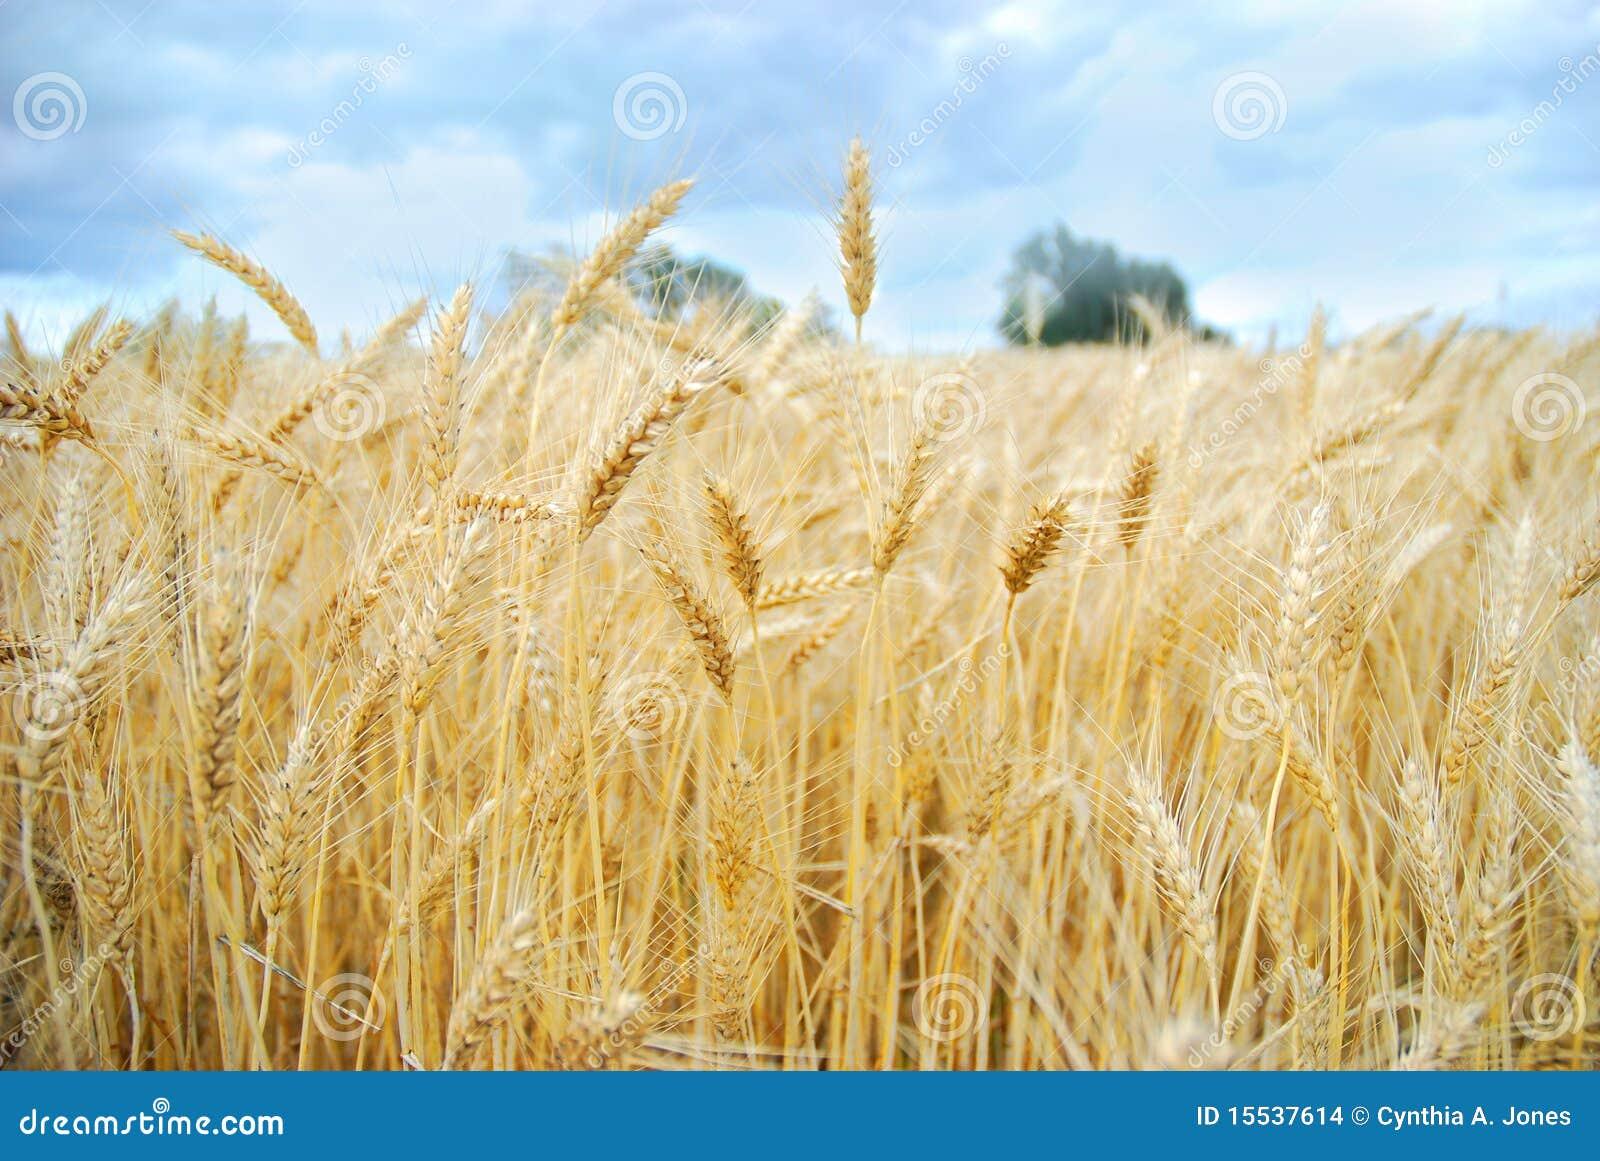 Moisson de zone de blé